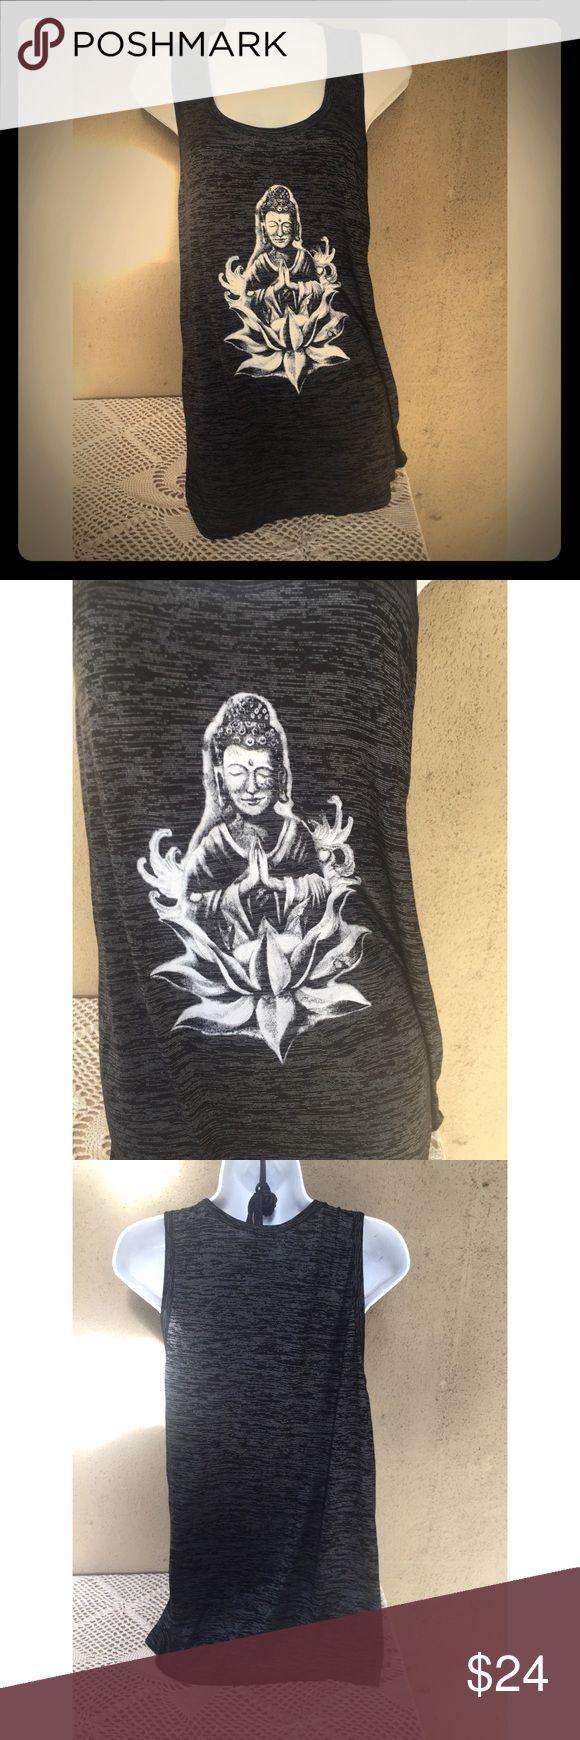 The 25  best Buddha lotus ideas on Pinterest | Buda face, Budha ... for Gautam Buddha Face Tattoo  195sfw